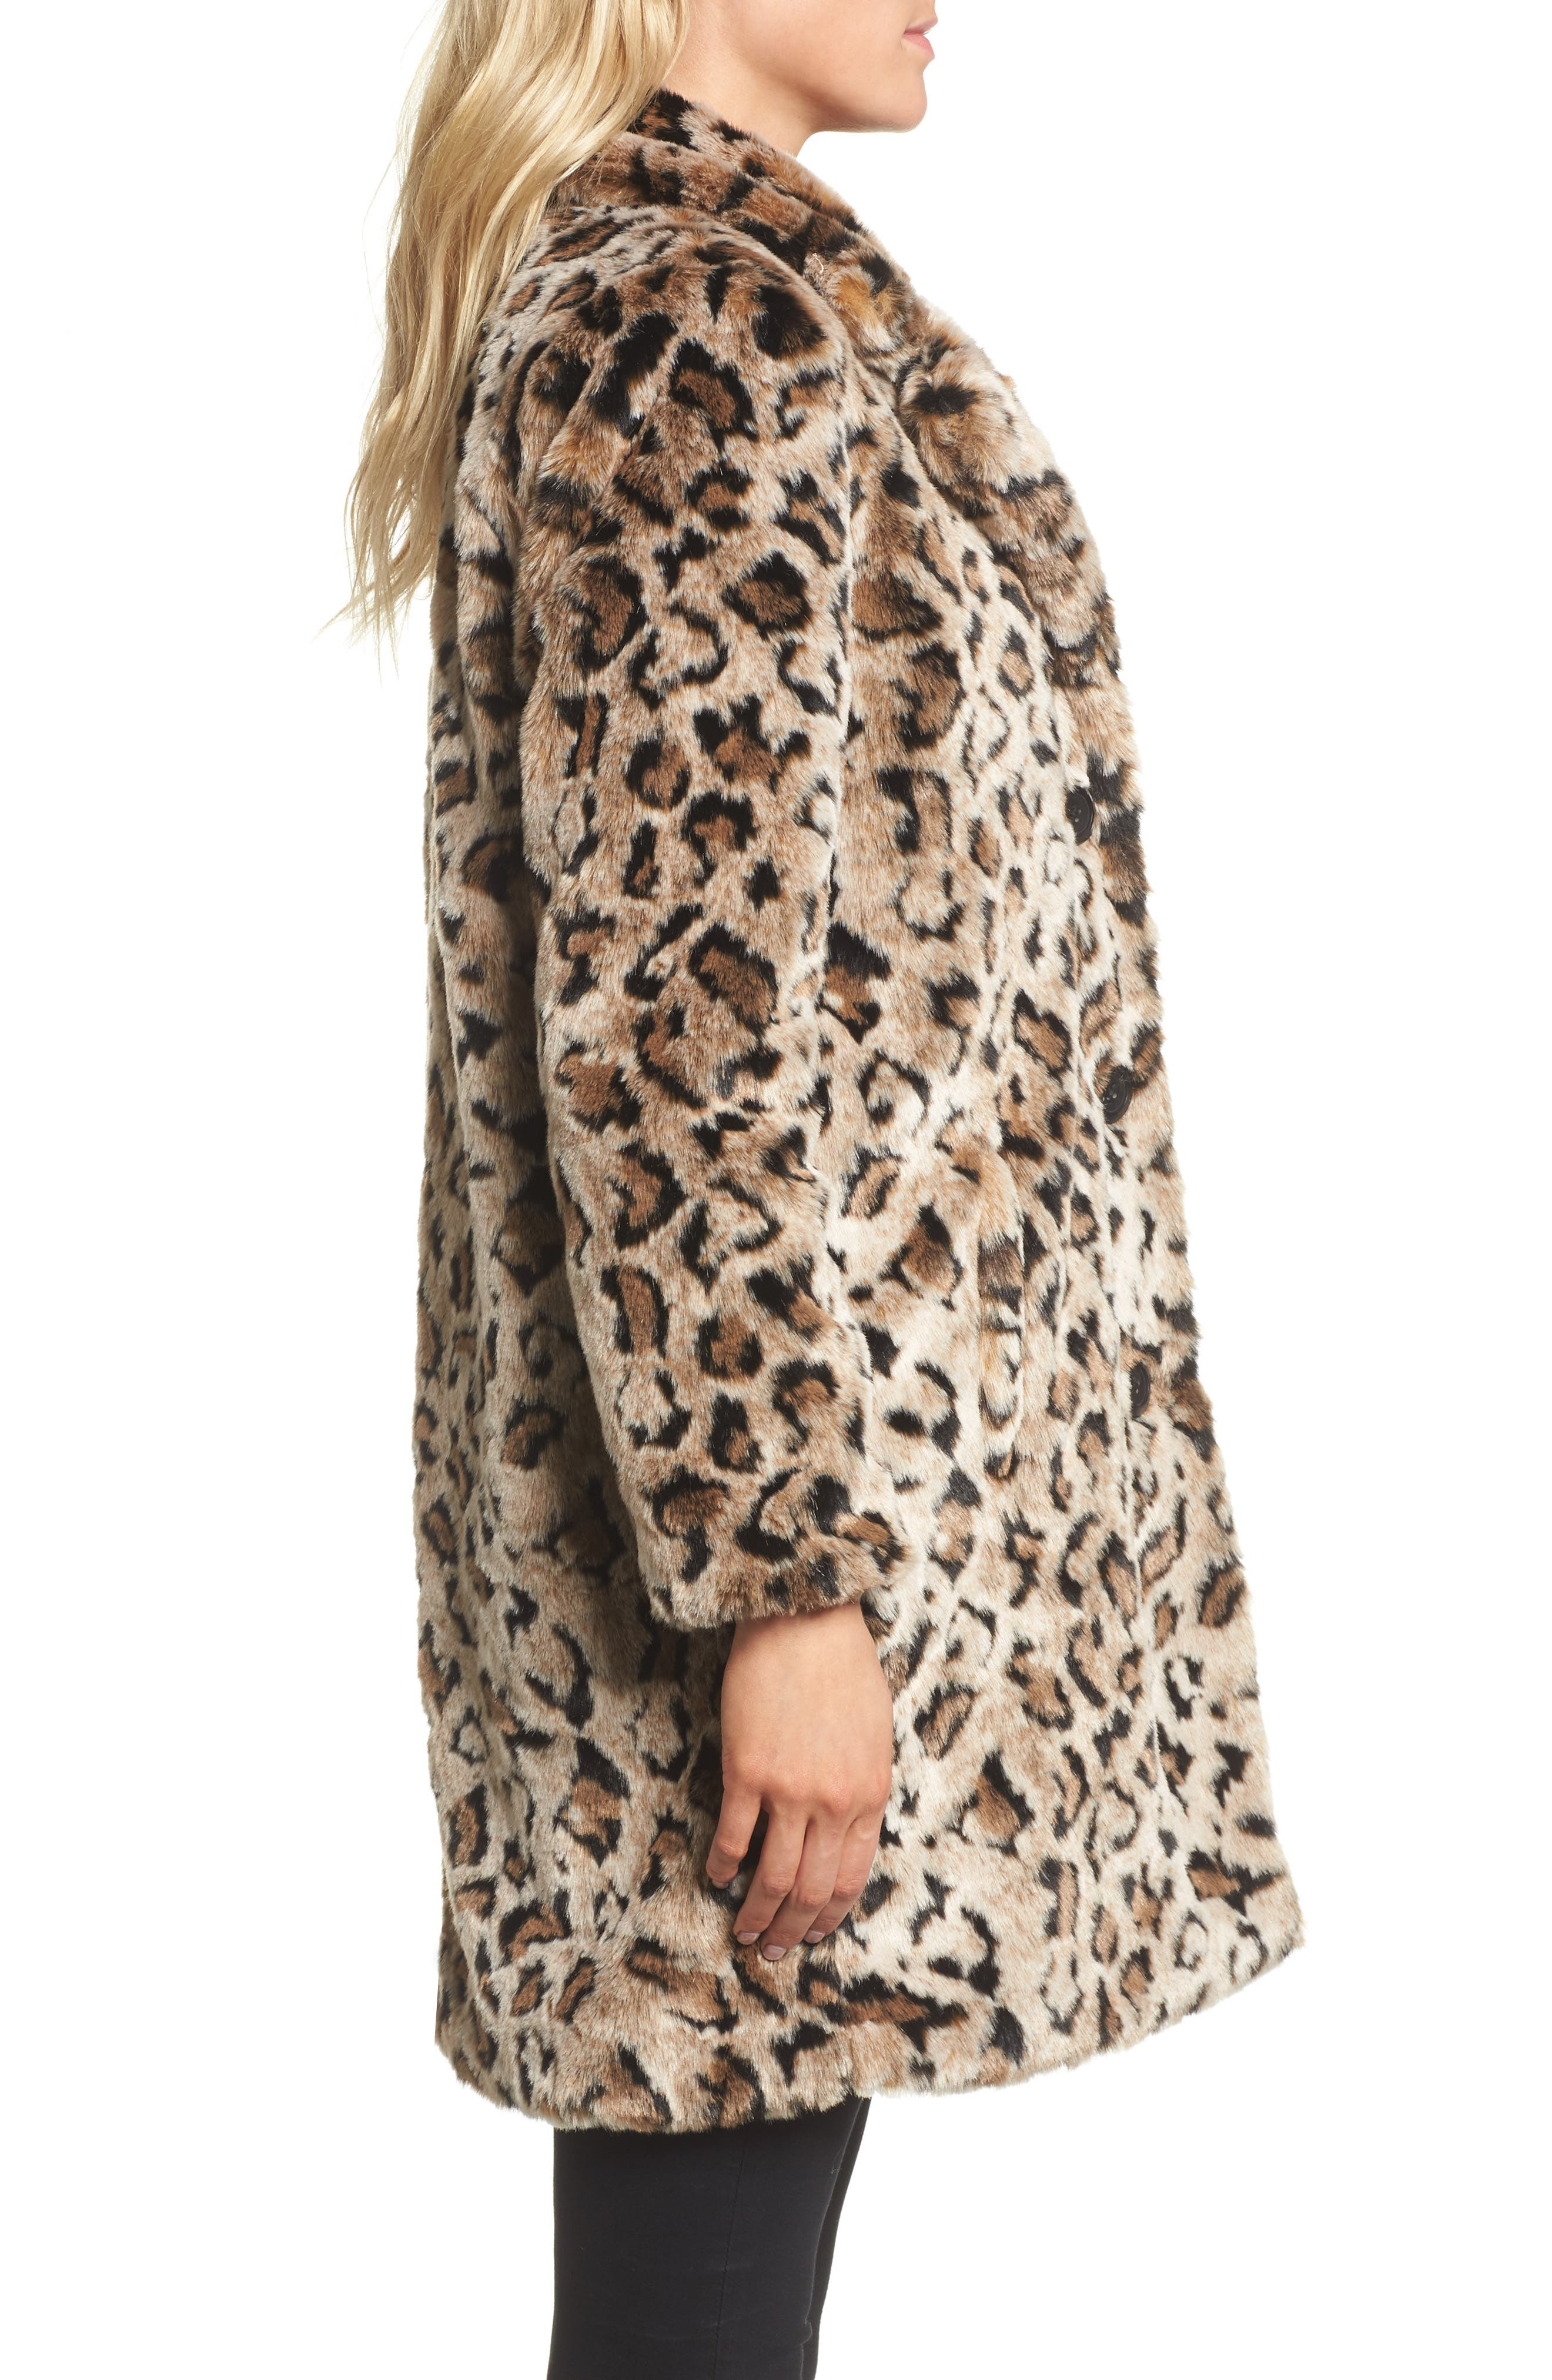 Abeni Faux Fur Coat,                             Alternate thumbnail 3, color,                             230